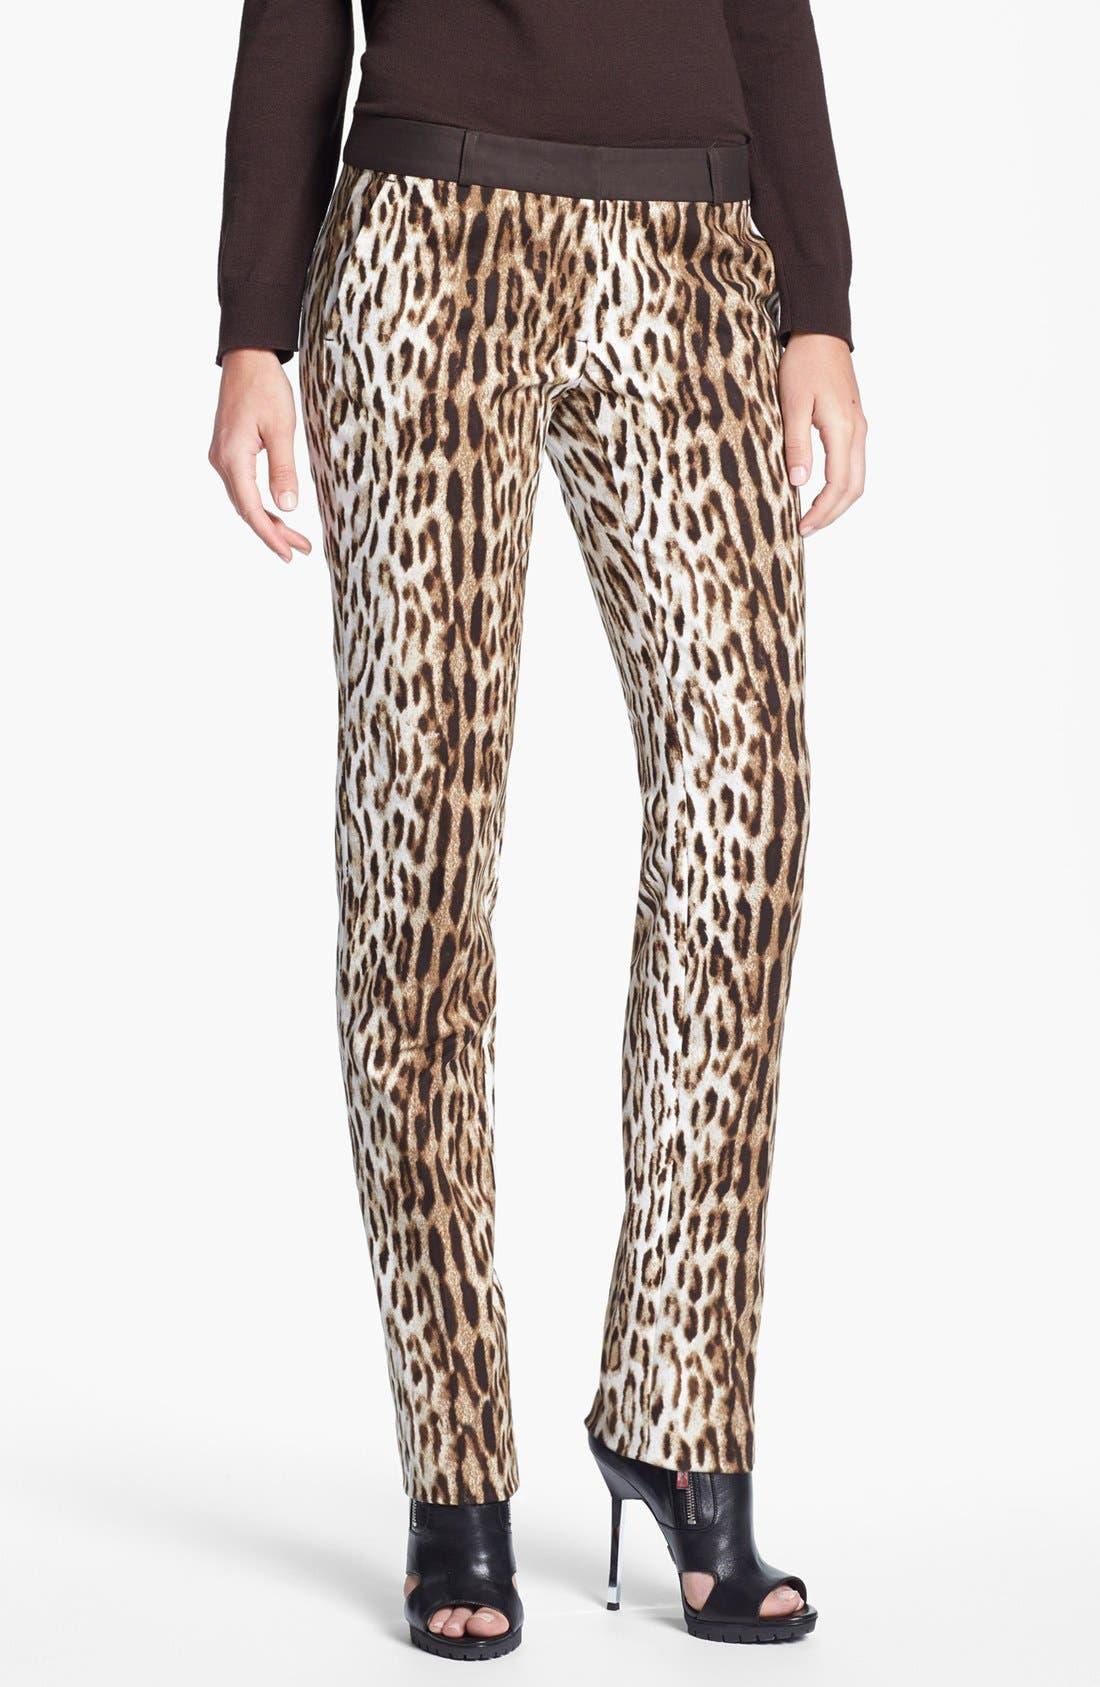 Main Image - MICHAEL Michael Kors 'Sexy Skinny' Leopard Print Stretch Pants (Regular & Petite)